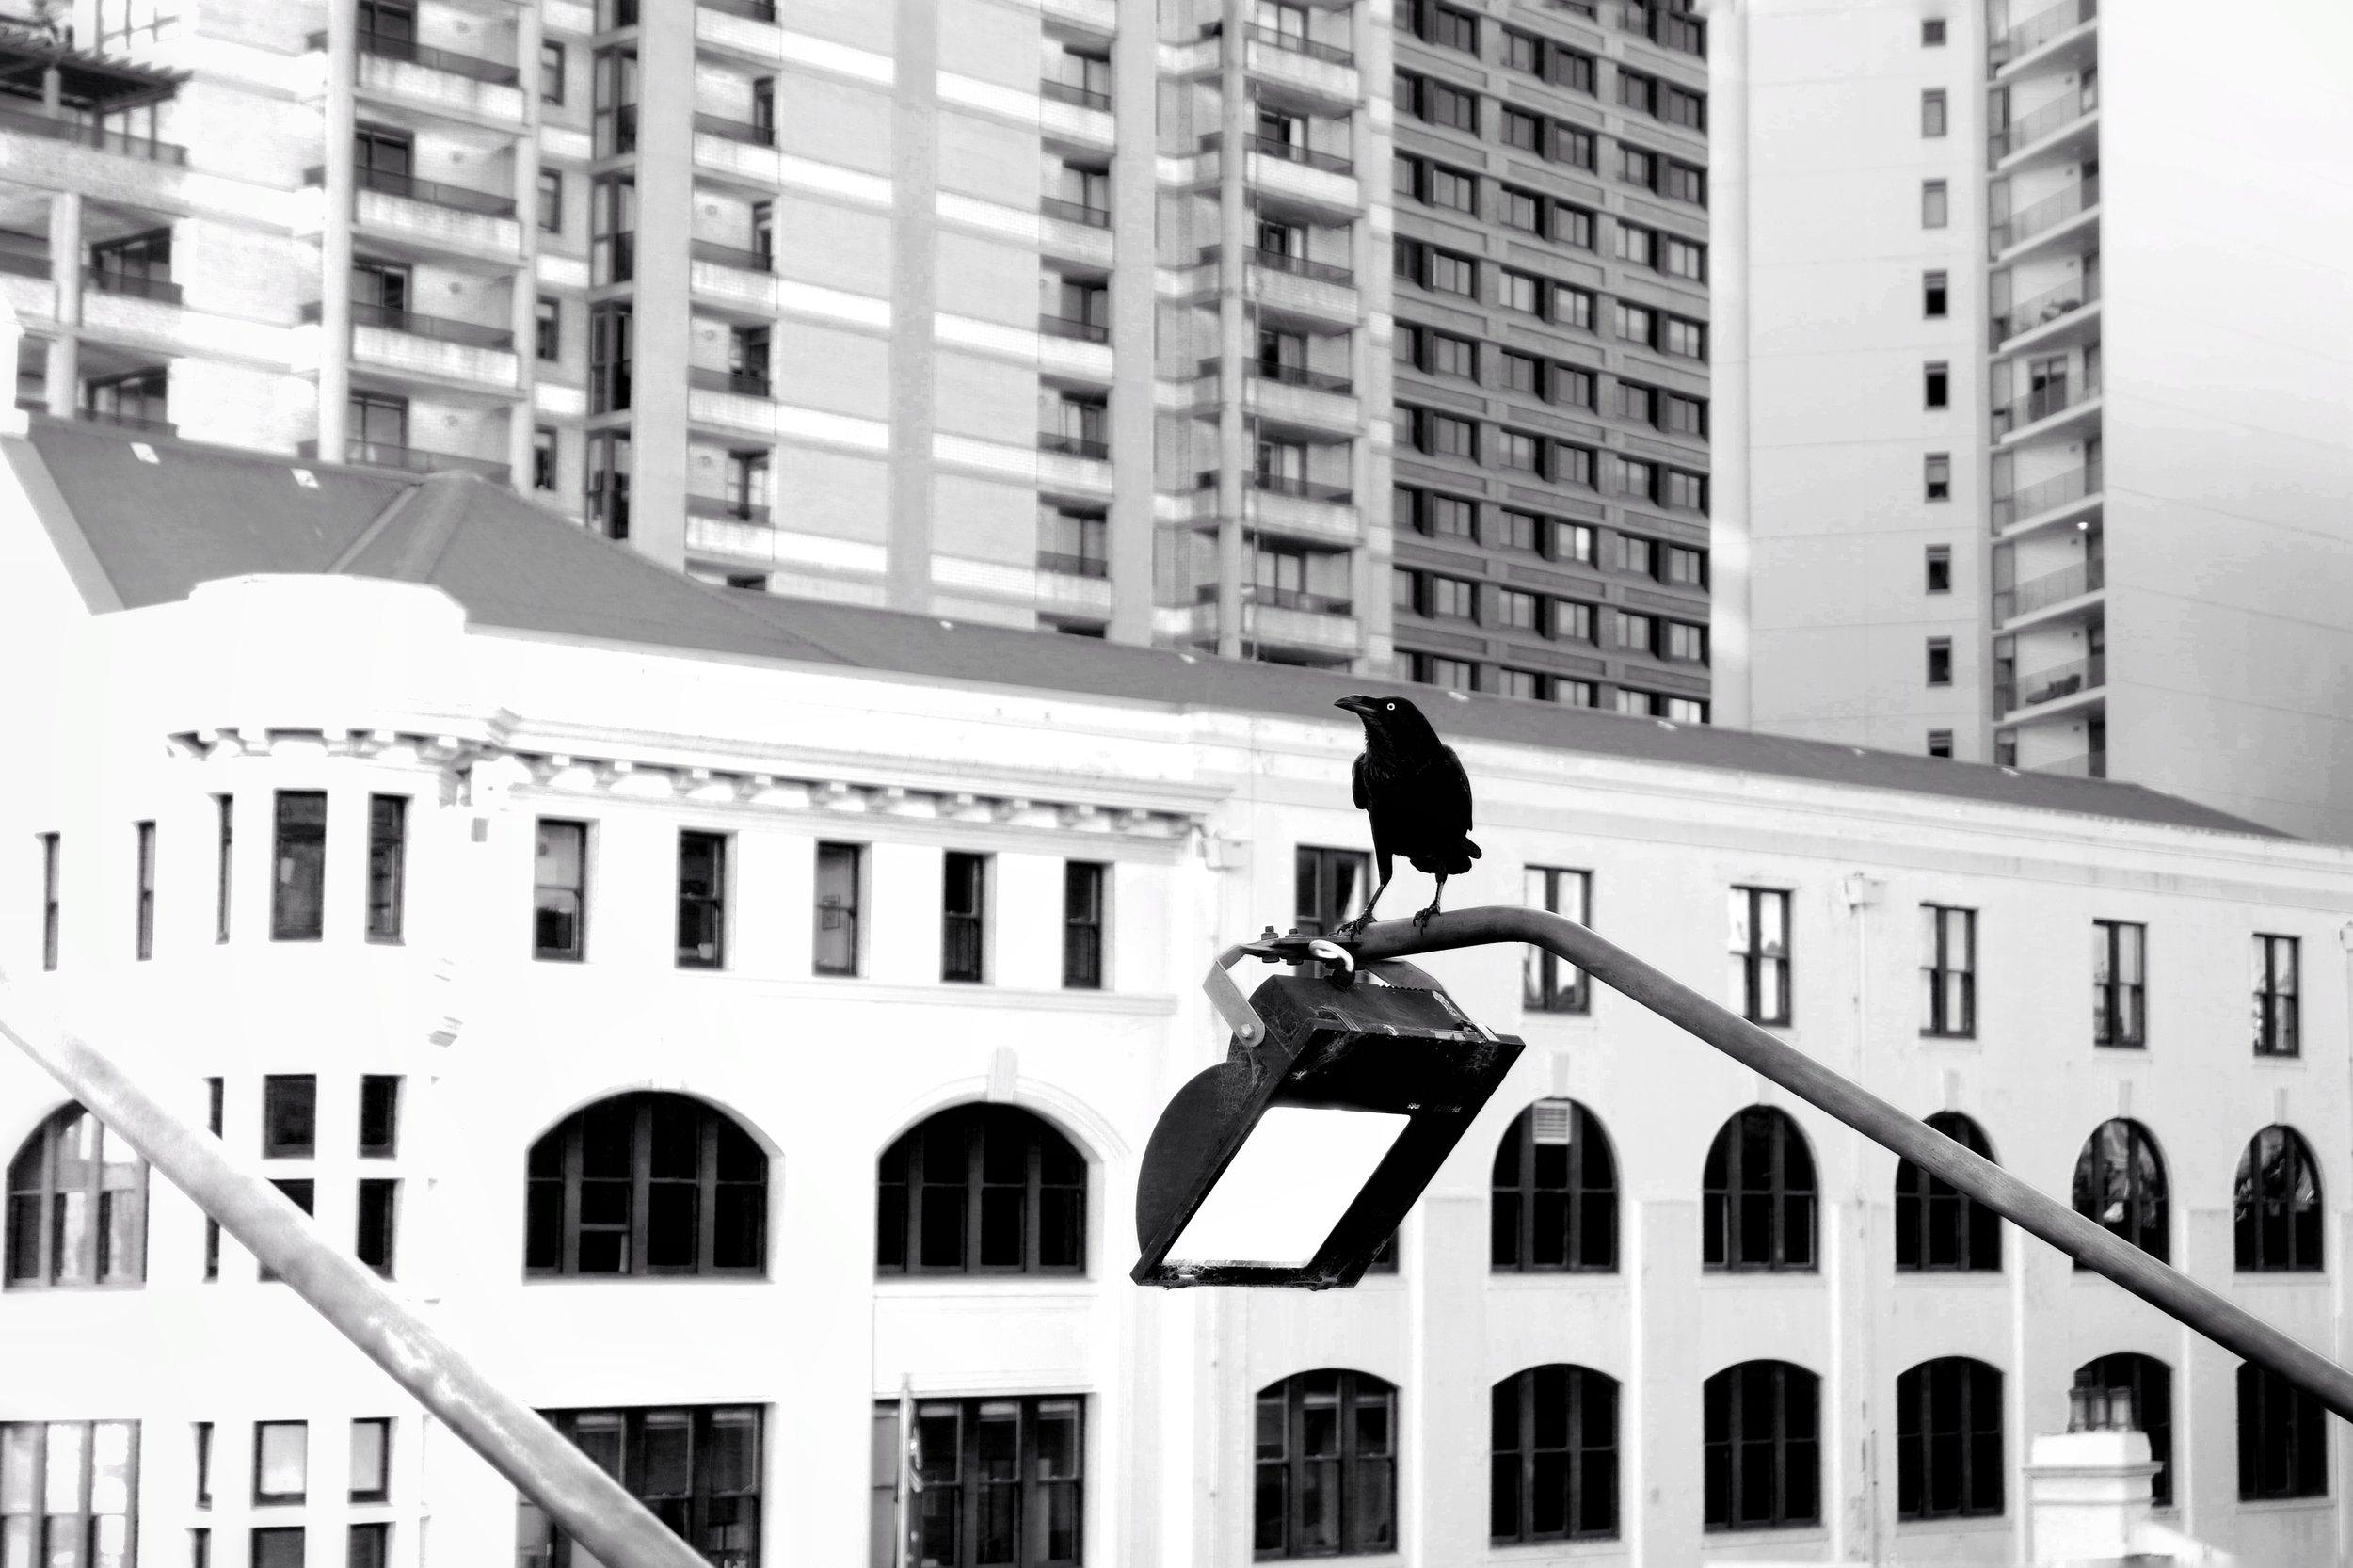 Urban crow